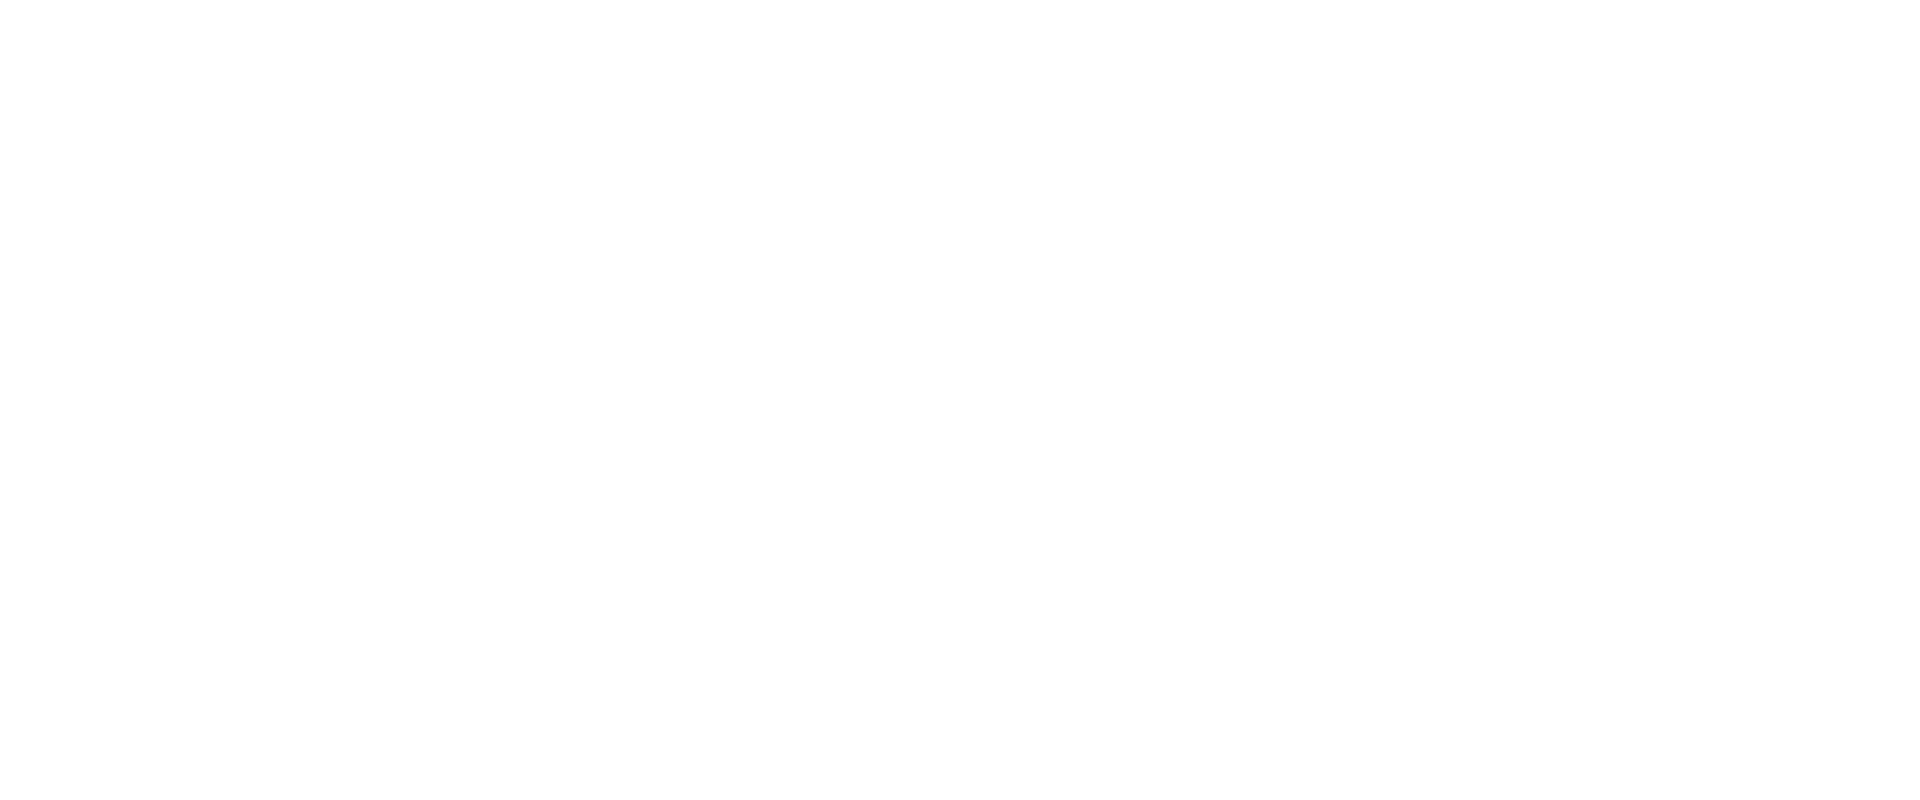 genius-gamingspeaker-sw-g51-3500